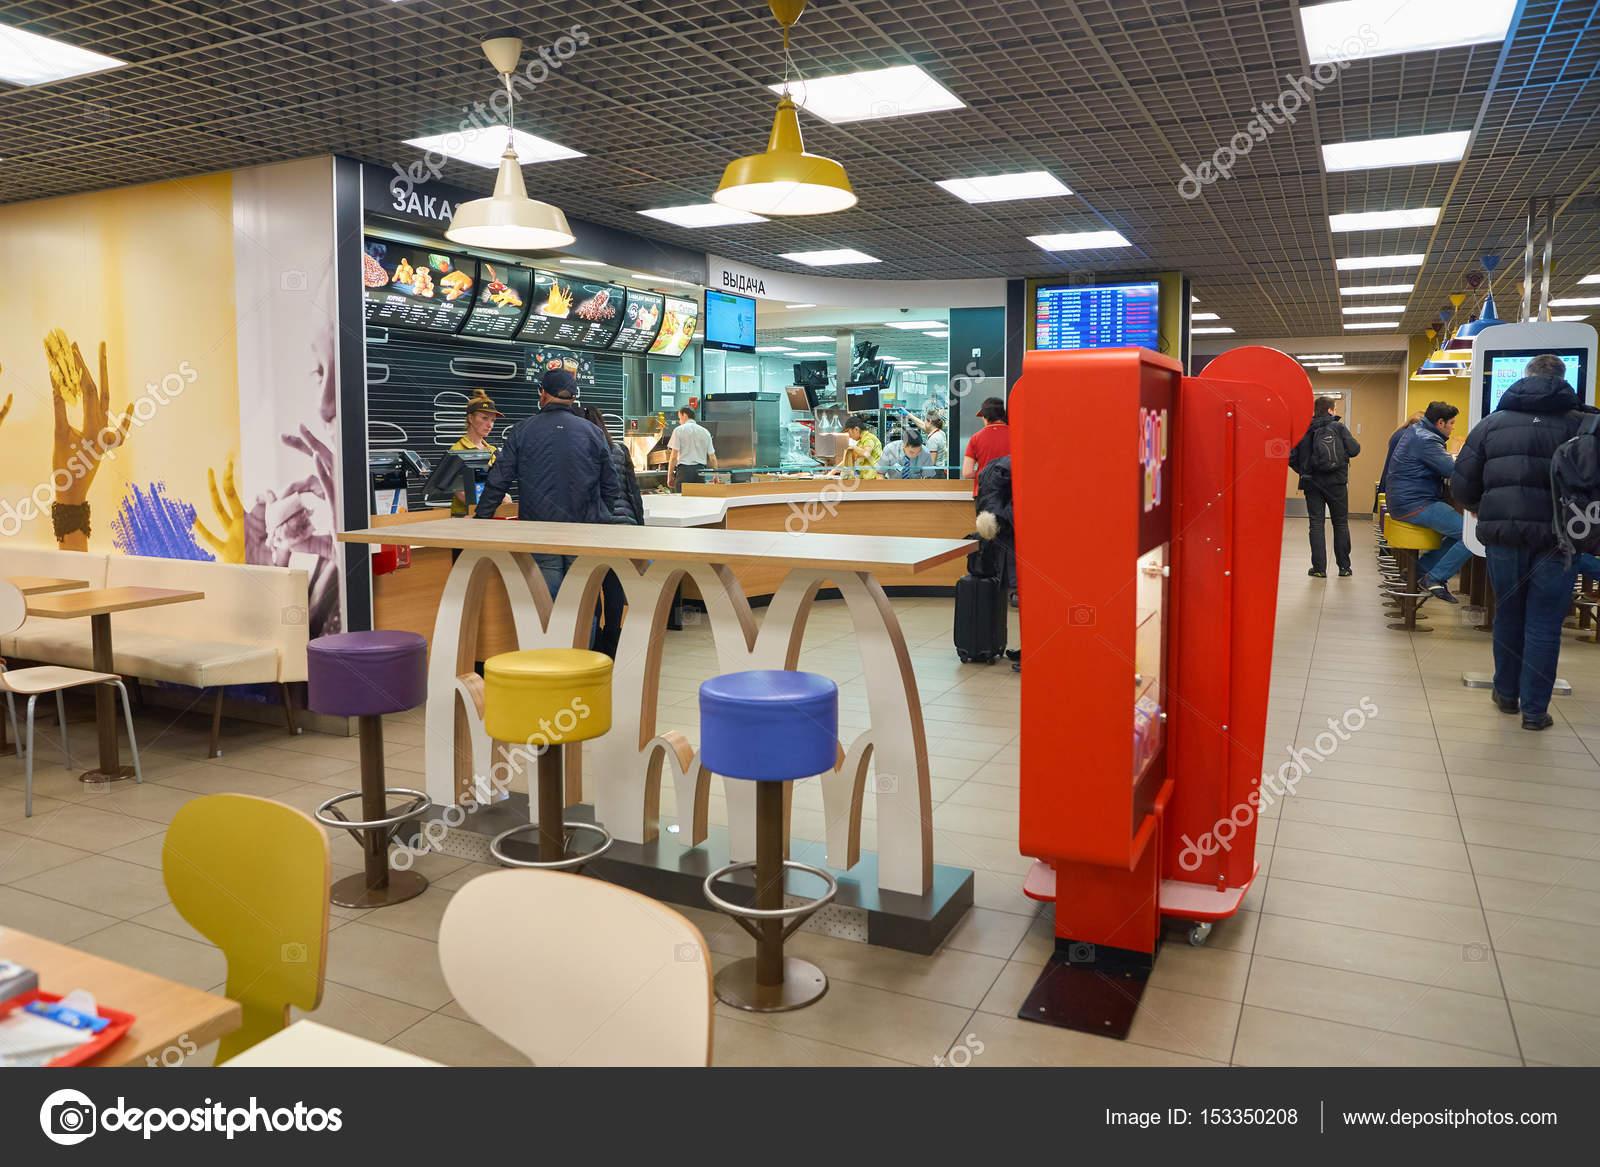 Mcdonald\'s-Restaurant — Redaktionelles Stockfoto © teamtime #153350208